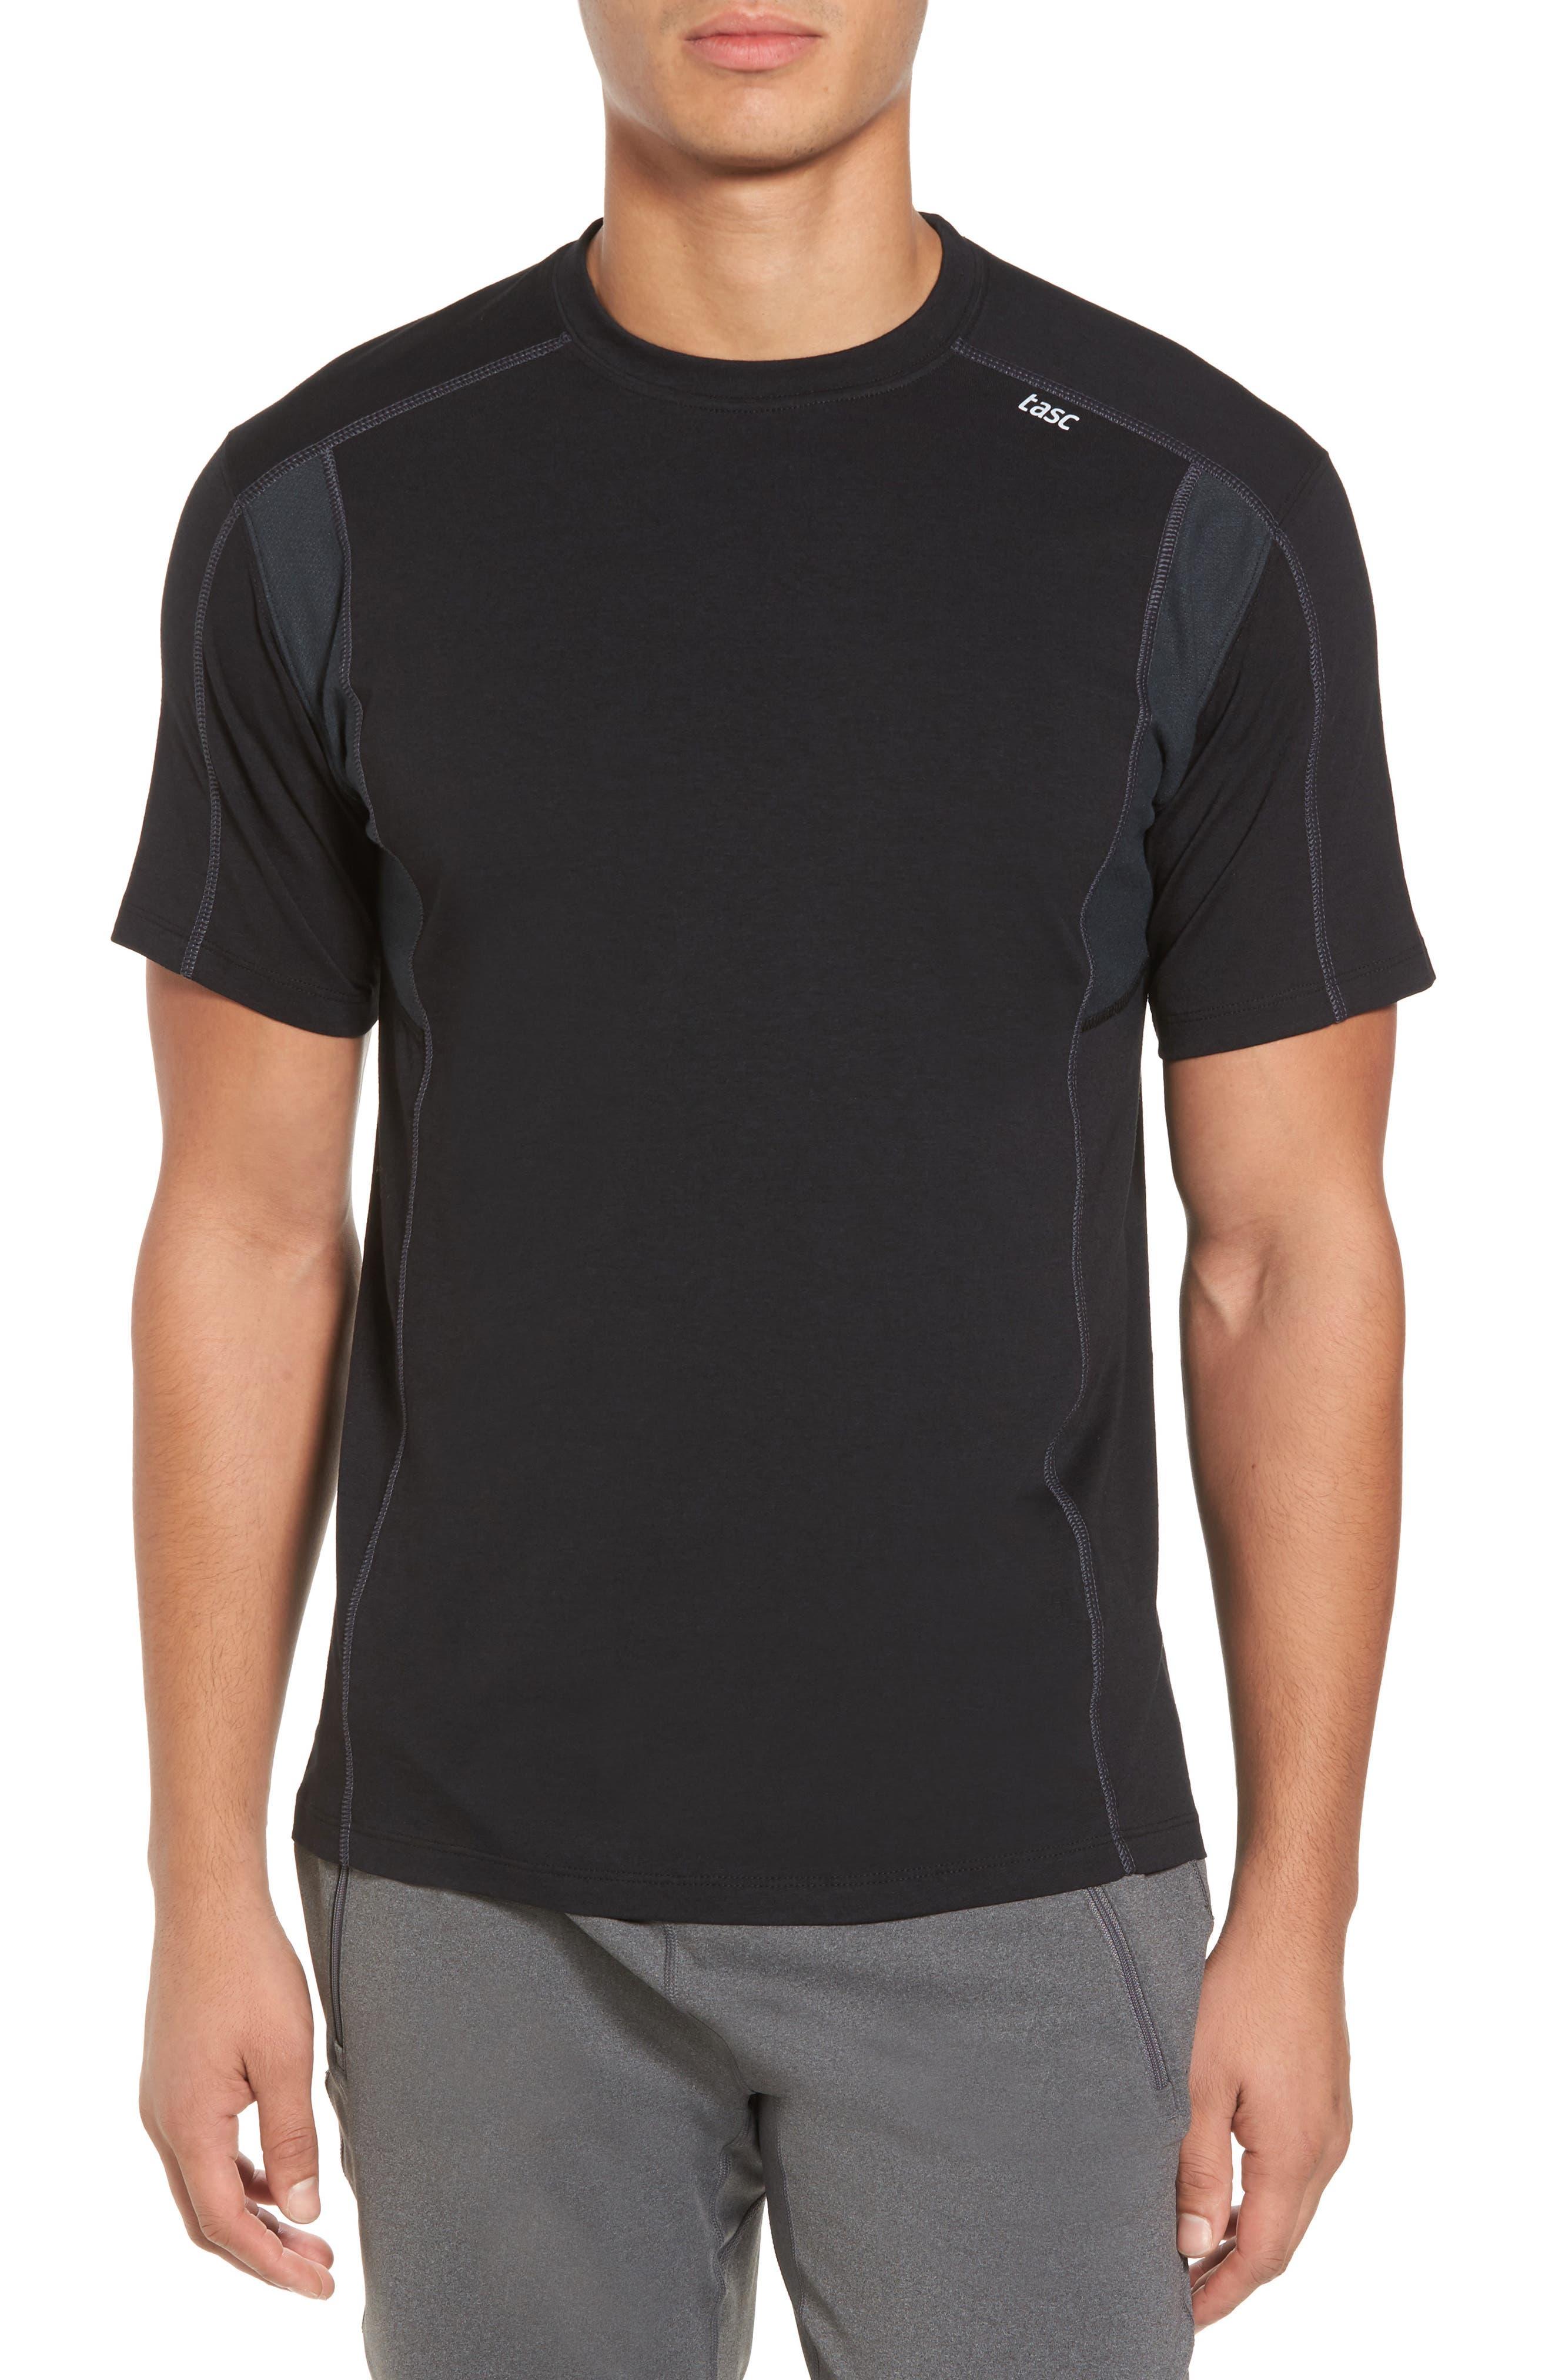 Charge Semi-Fitted T-Shirt,                             Main thumbnail 1, color,                             Black/ Gunmetal